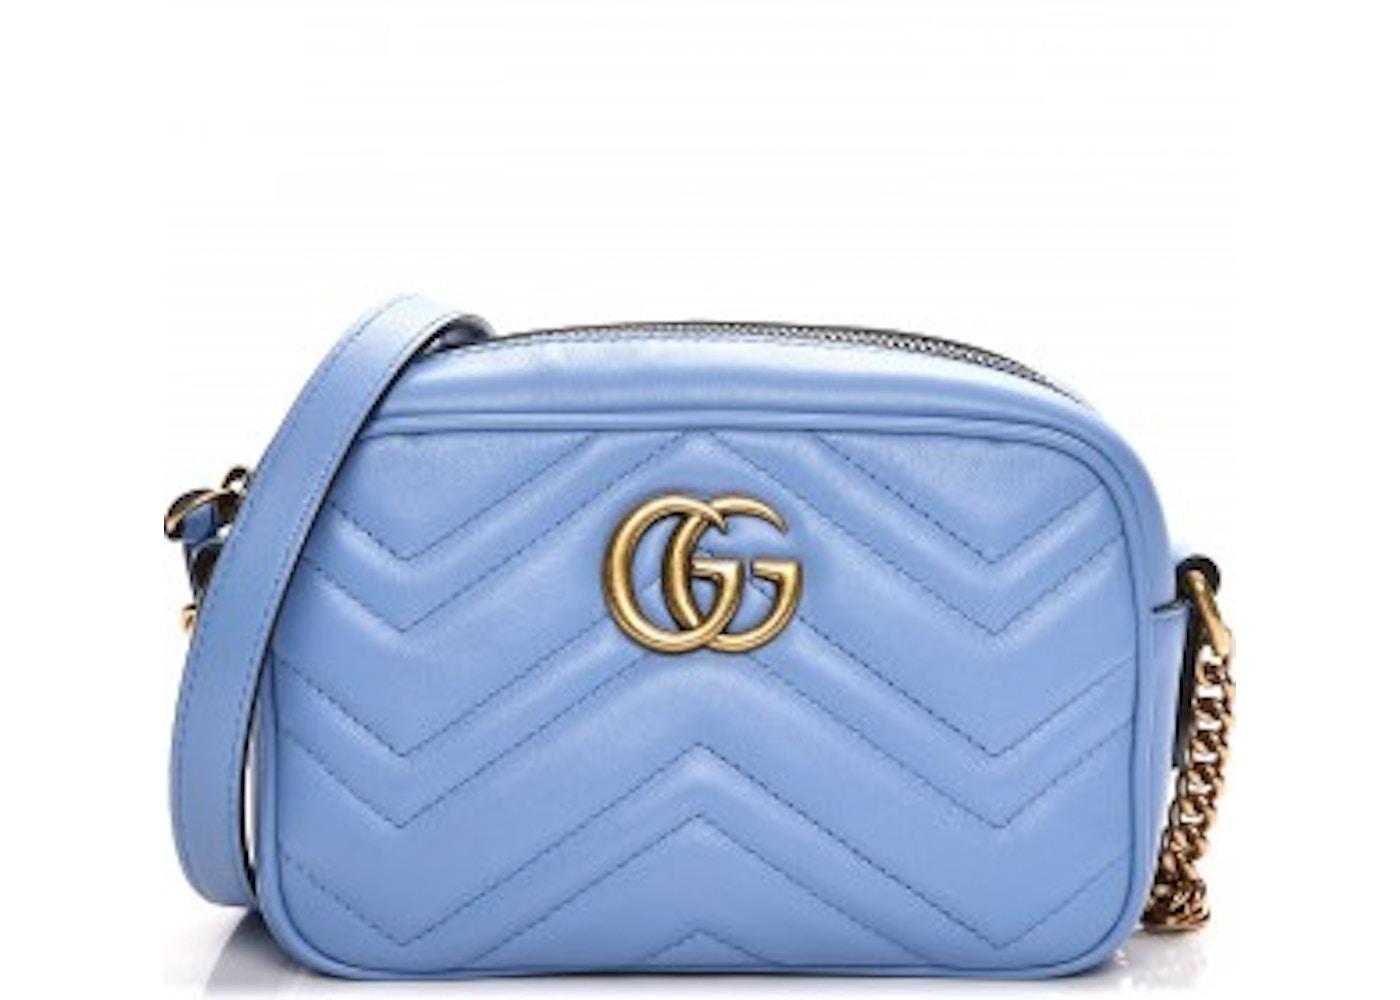 cc879574e670 Gucci Marmont Matelasse GG Interlocking GG Mini Light Blue. GG Interlocking GG  Mini Light Blue